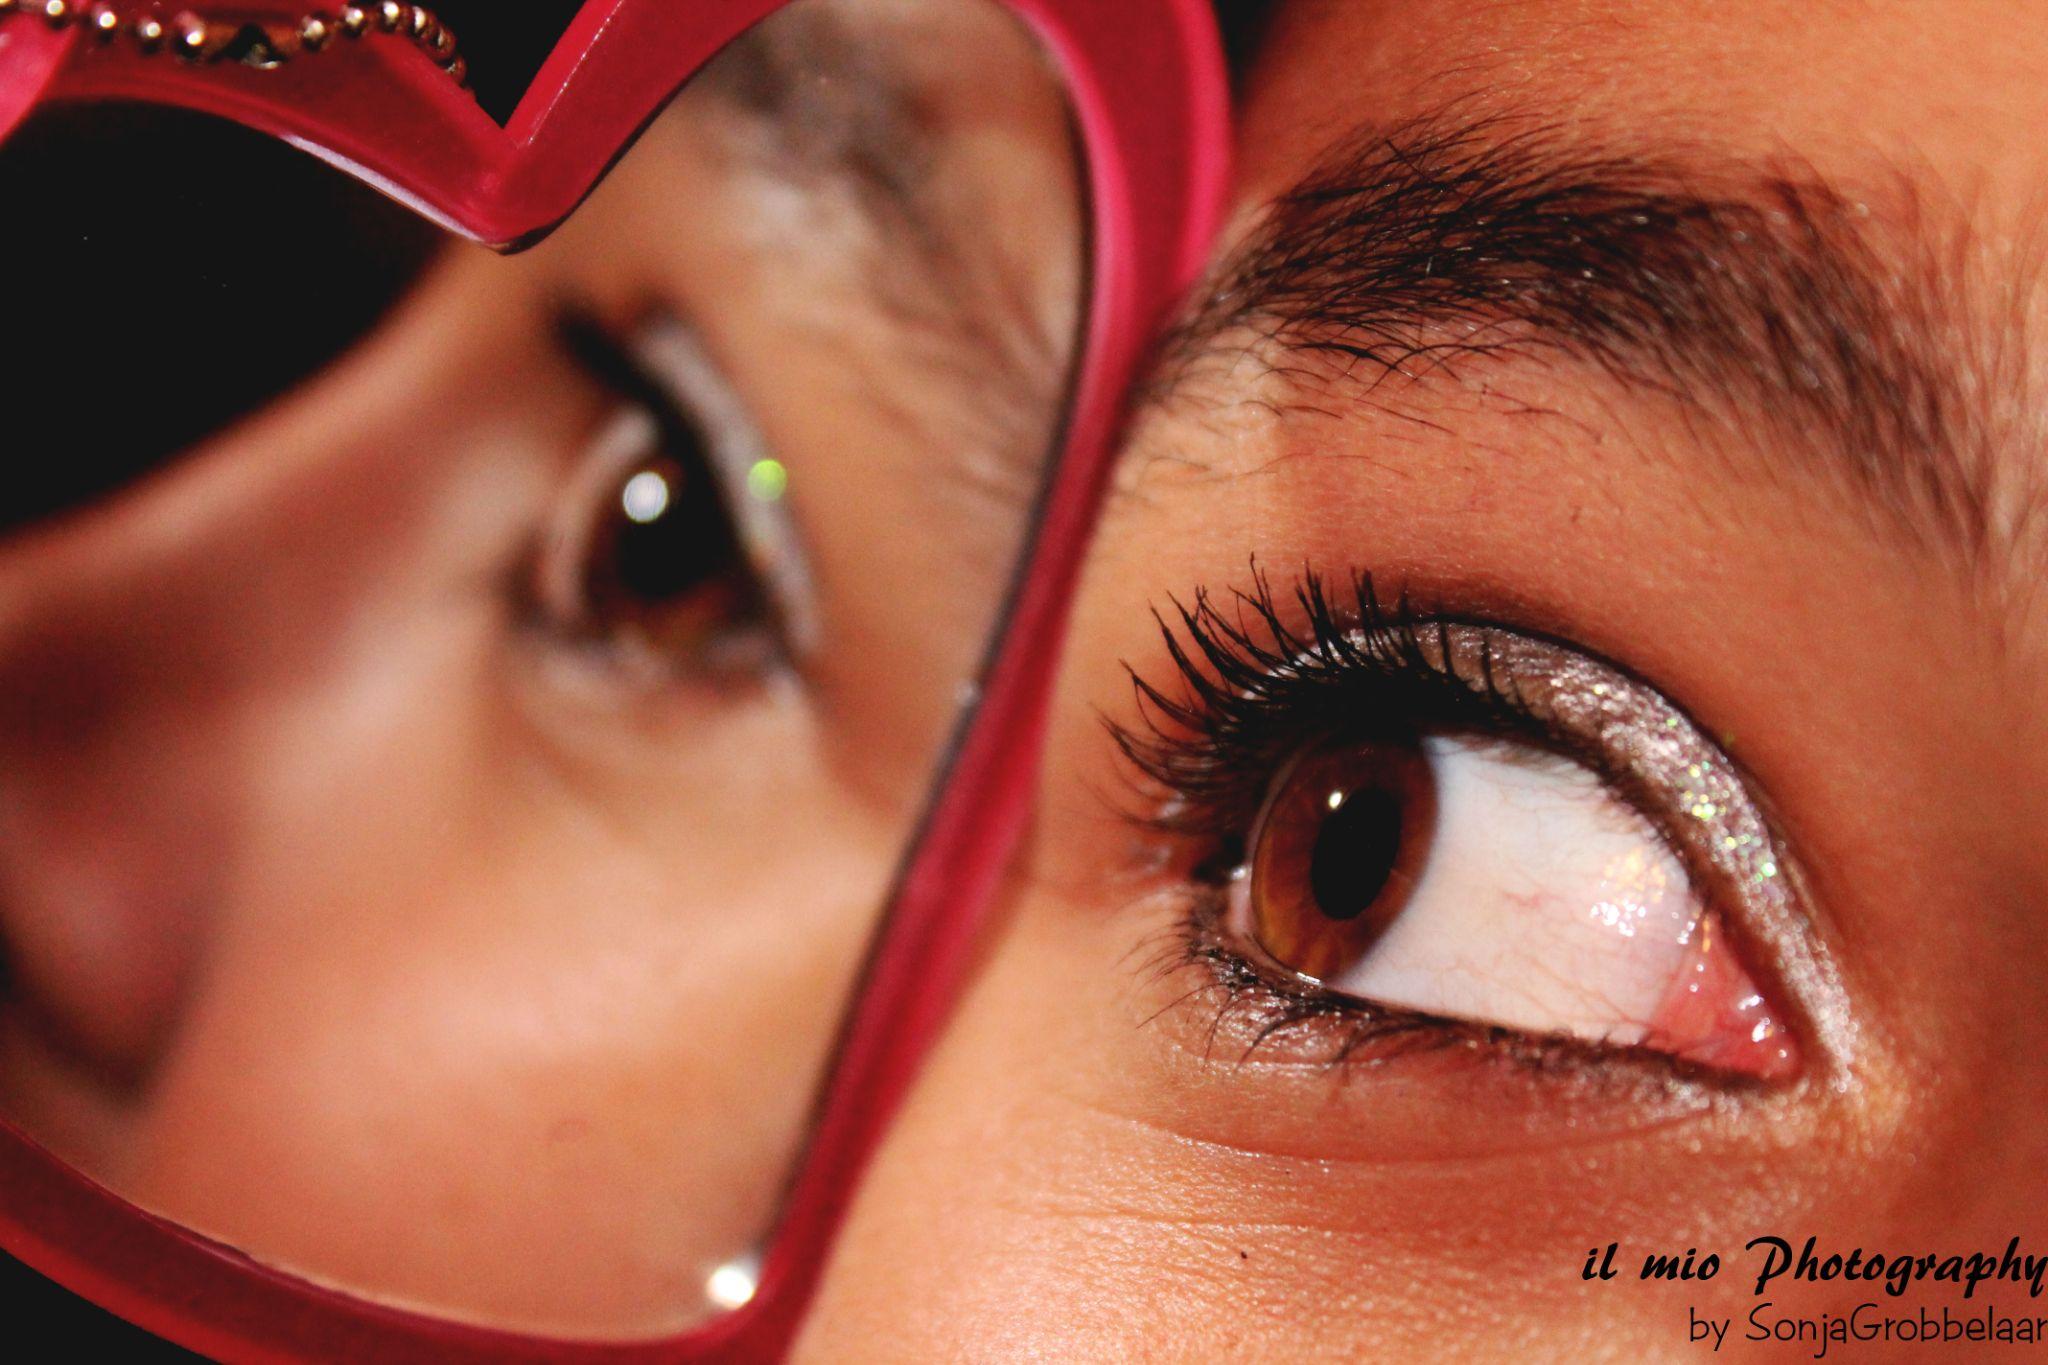 il mio Photography by Sonja Grobbelaar